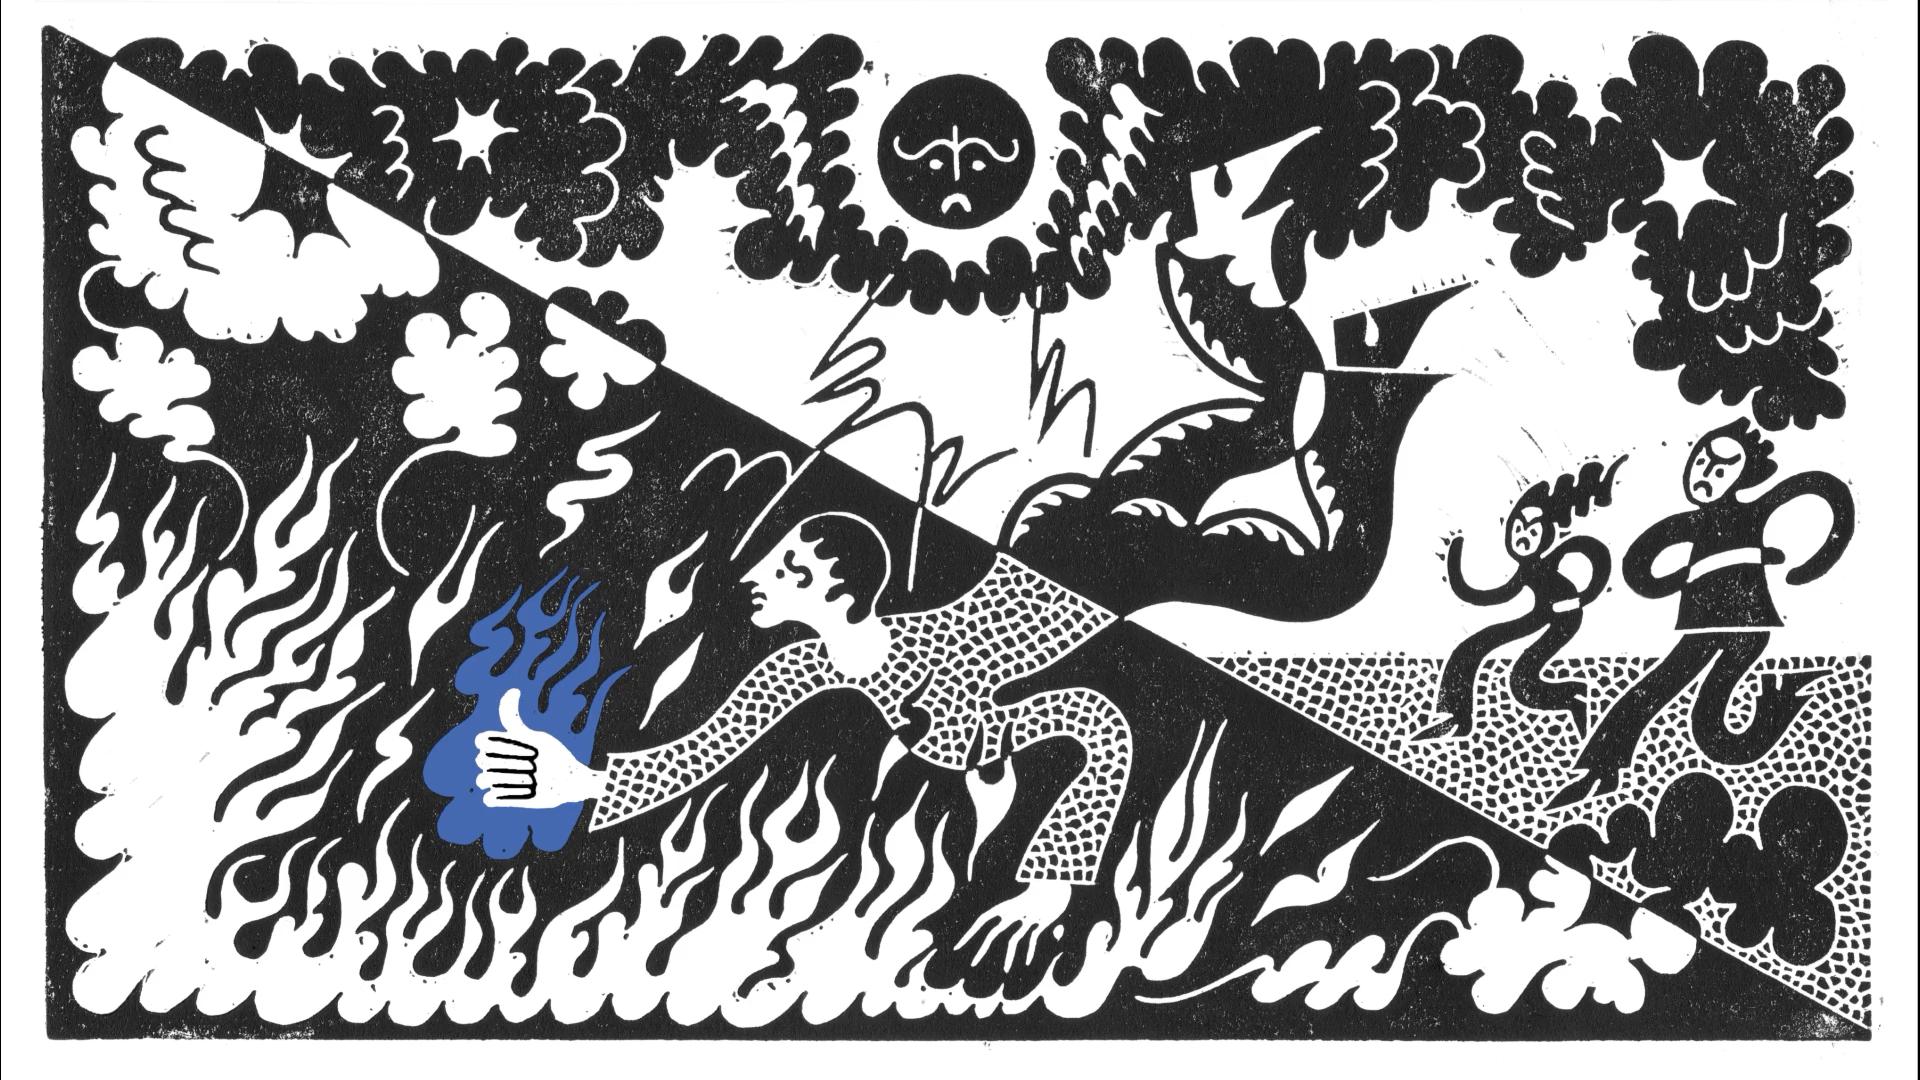 Illustration by SOPHY HOLLINGTON